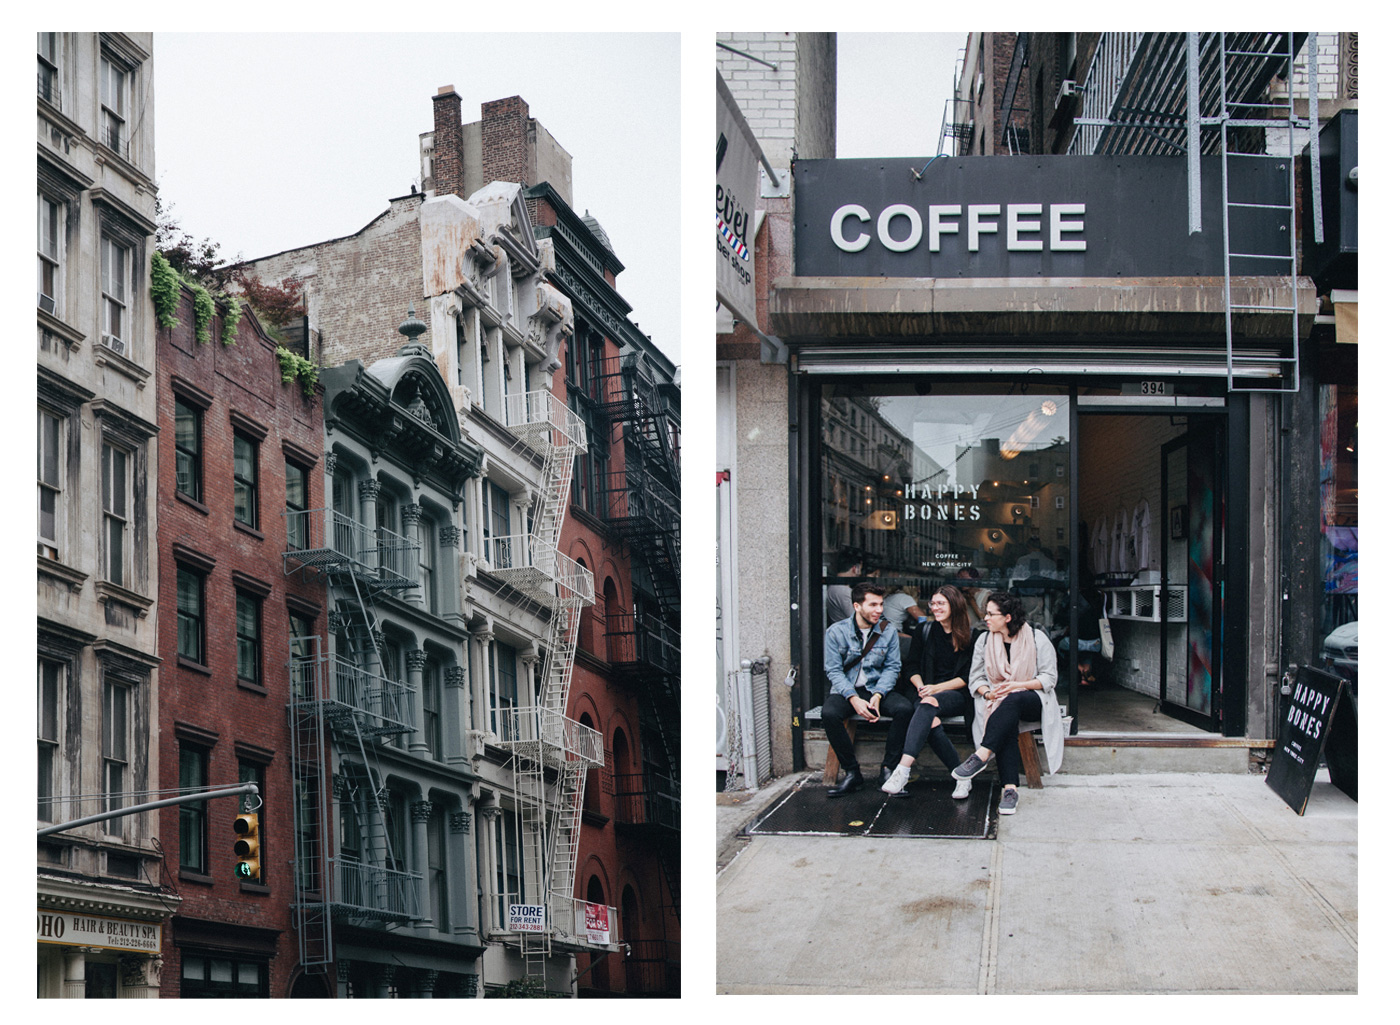 Soho and a nice coffee shop called Happy Bones